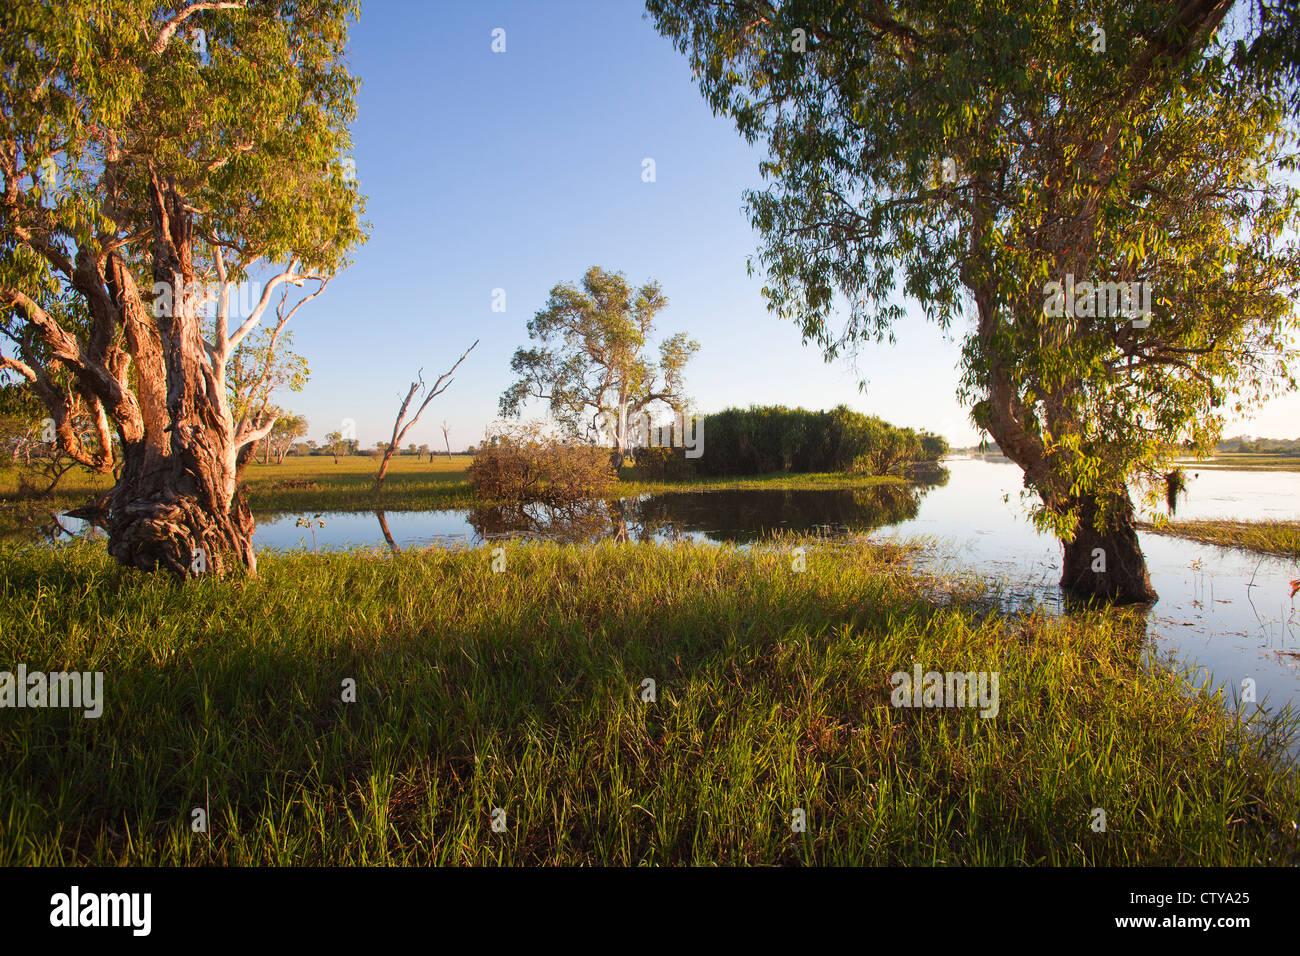 yellow water billabong, Australia - Stock Image